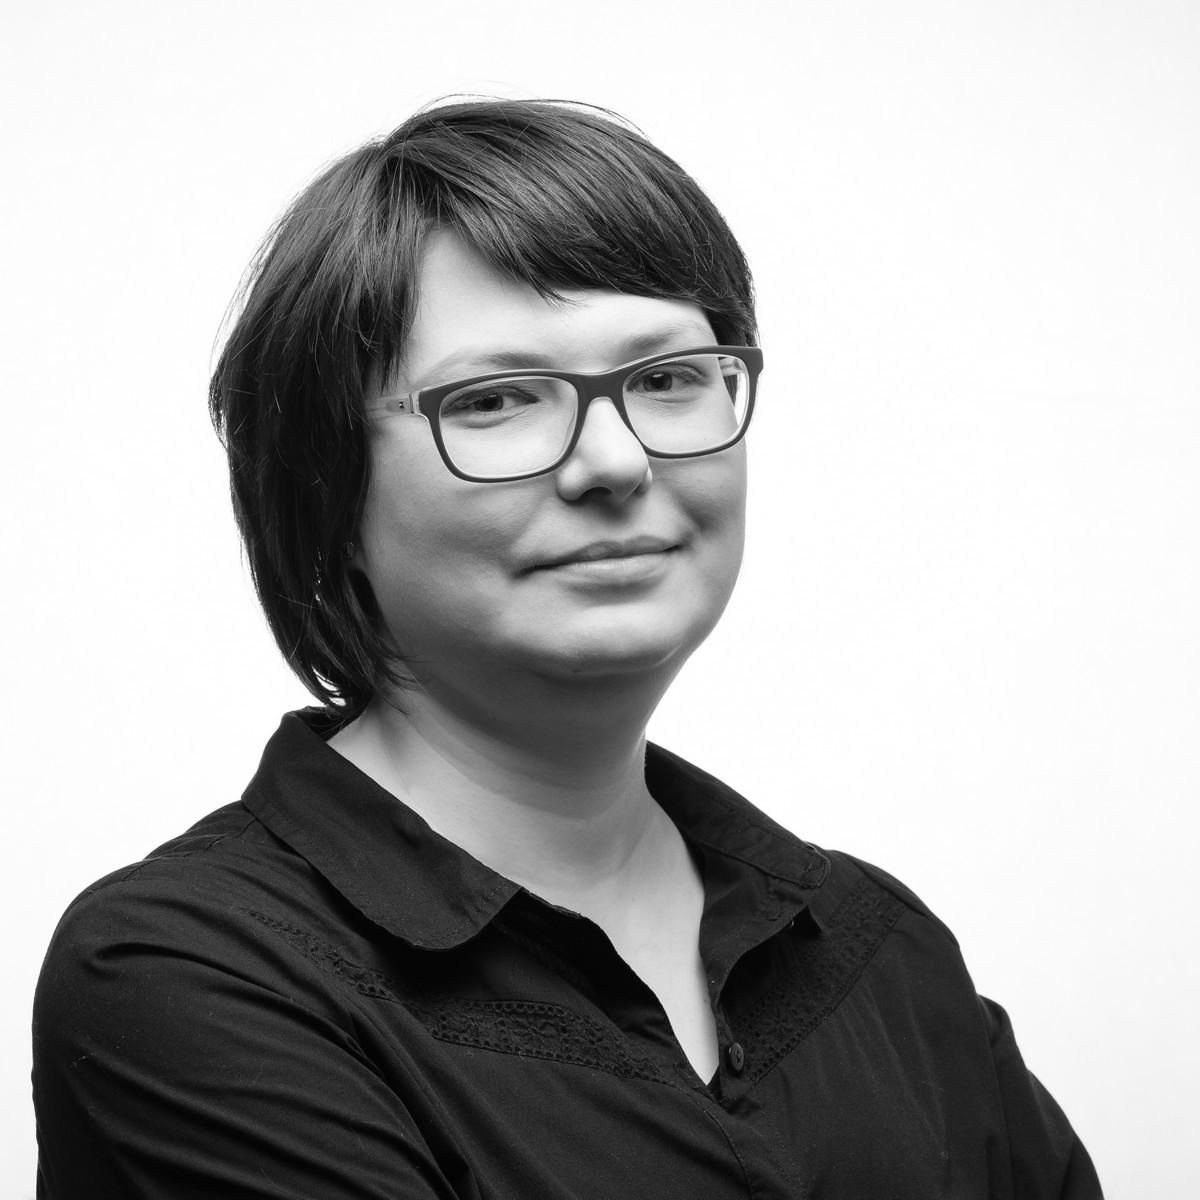 Marta Mišaniová